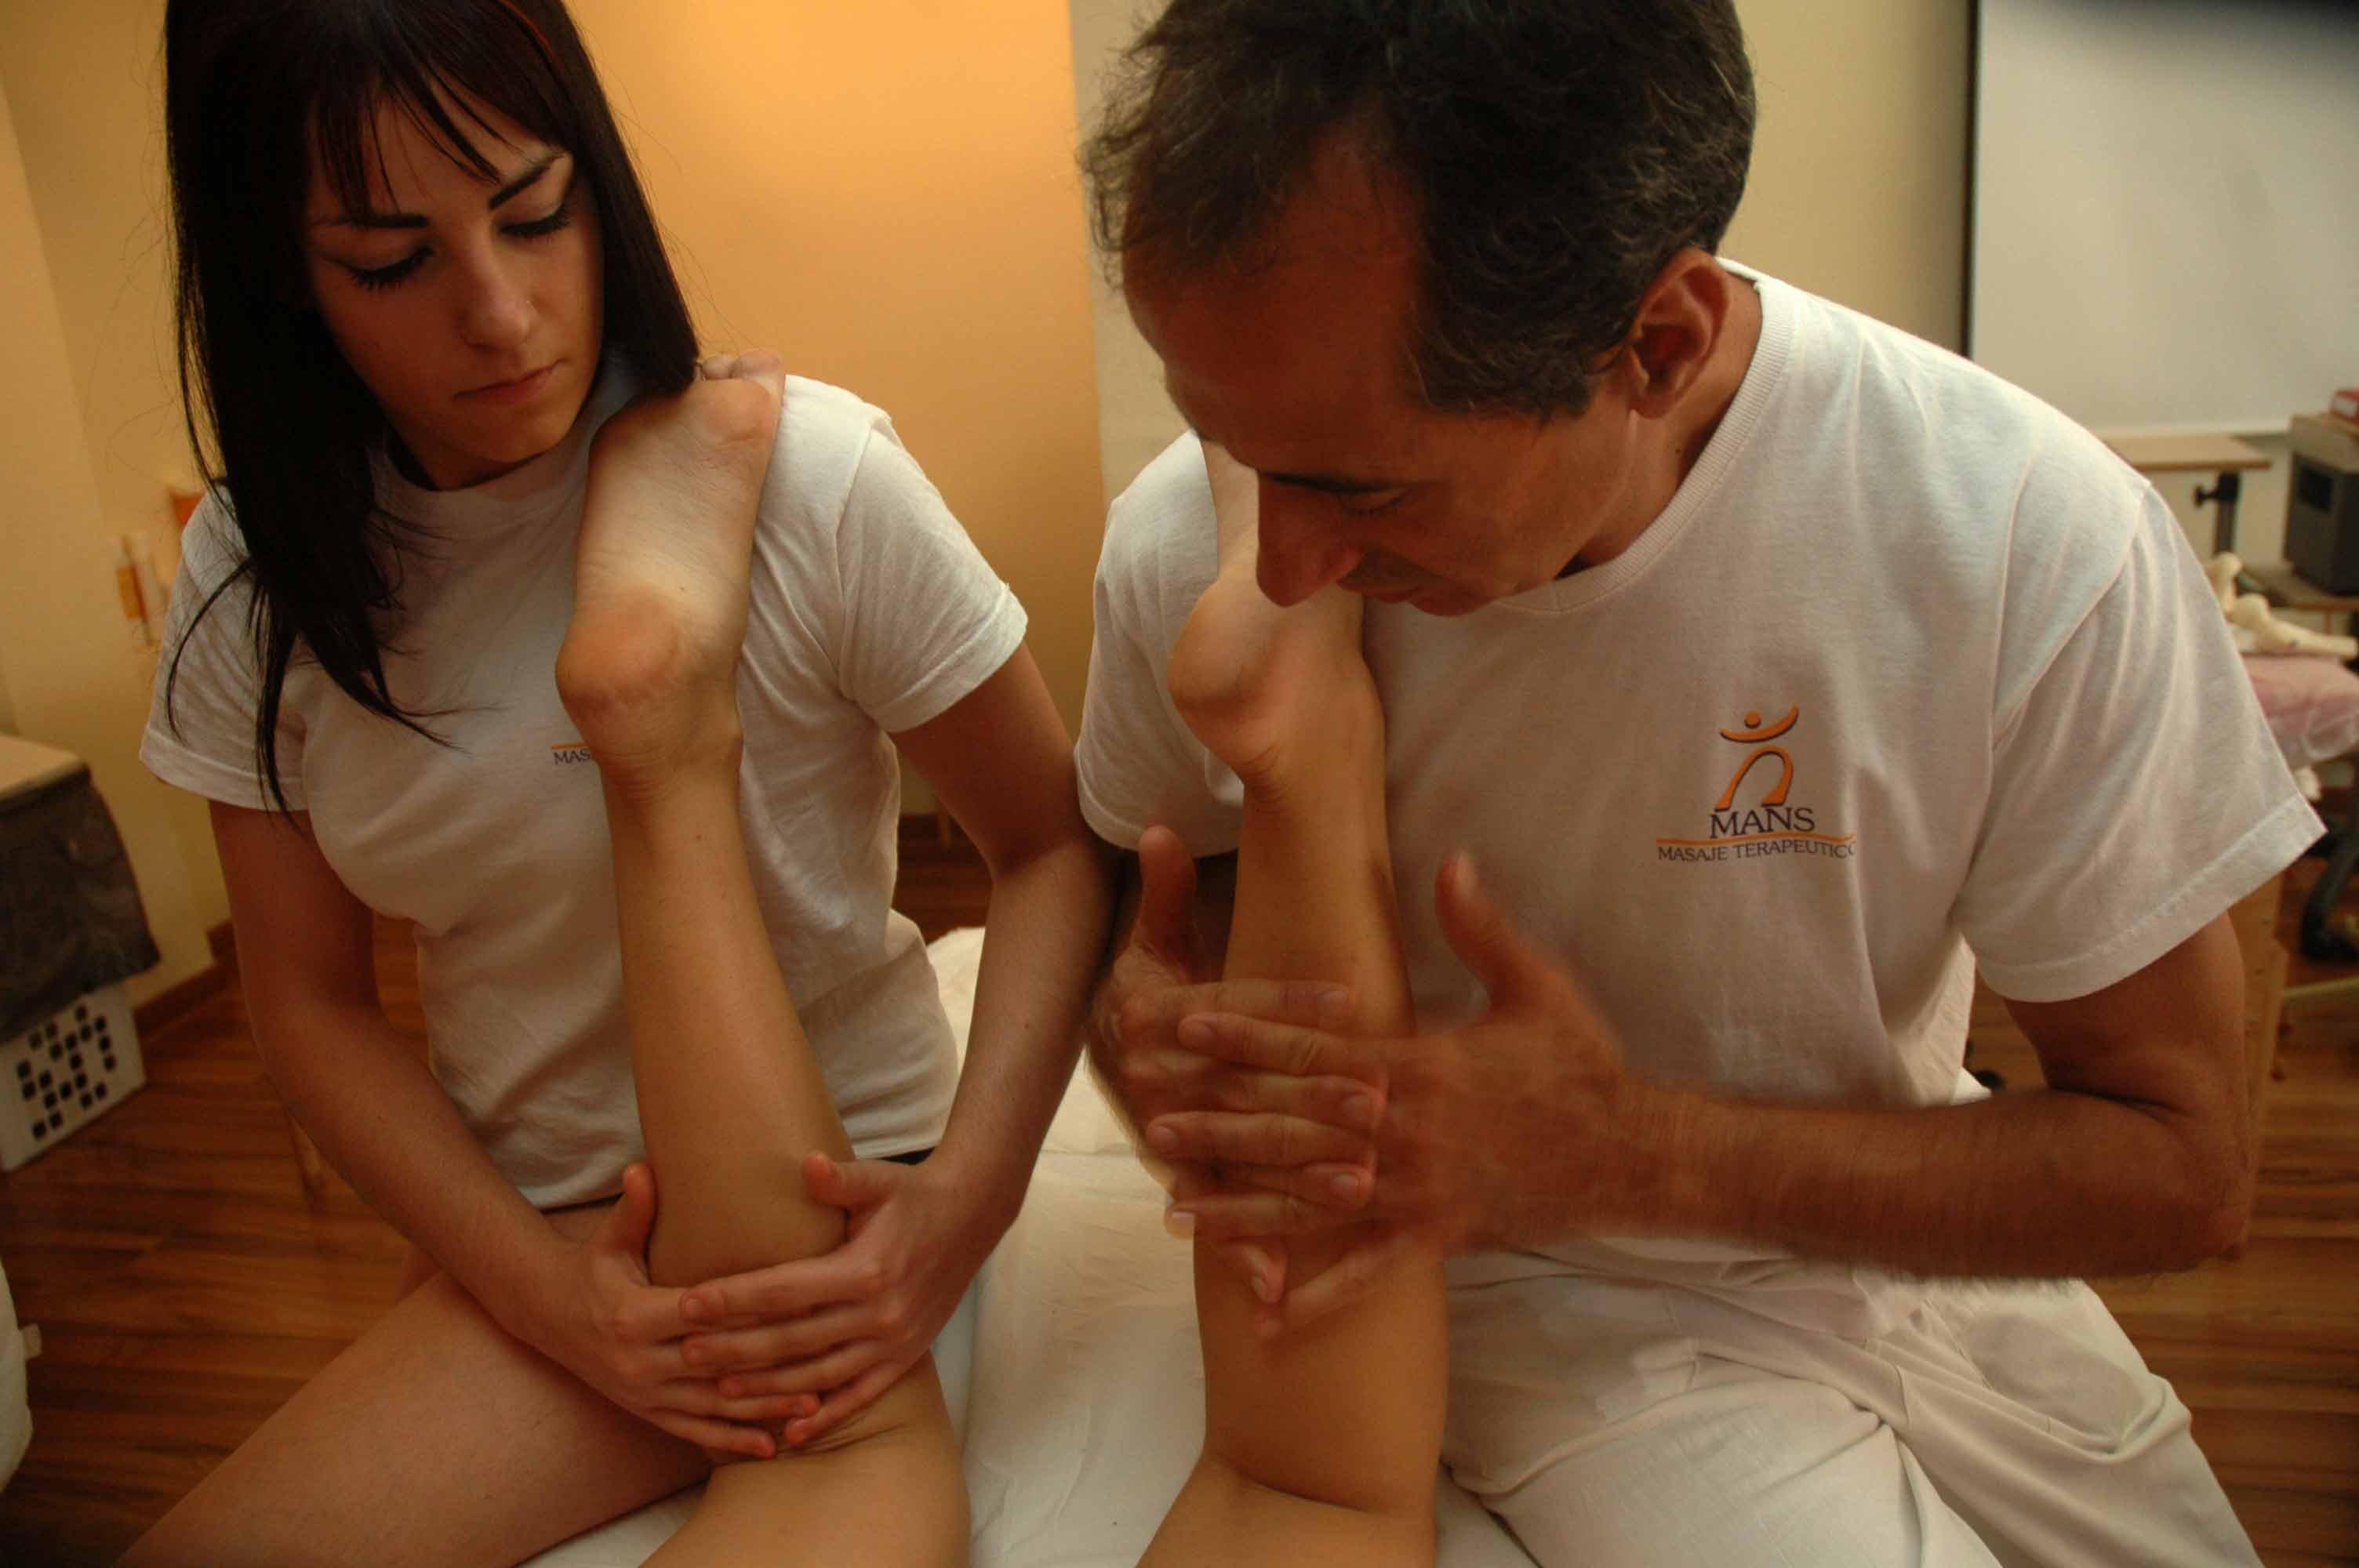 Curso de masaje mans